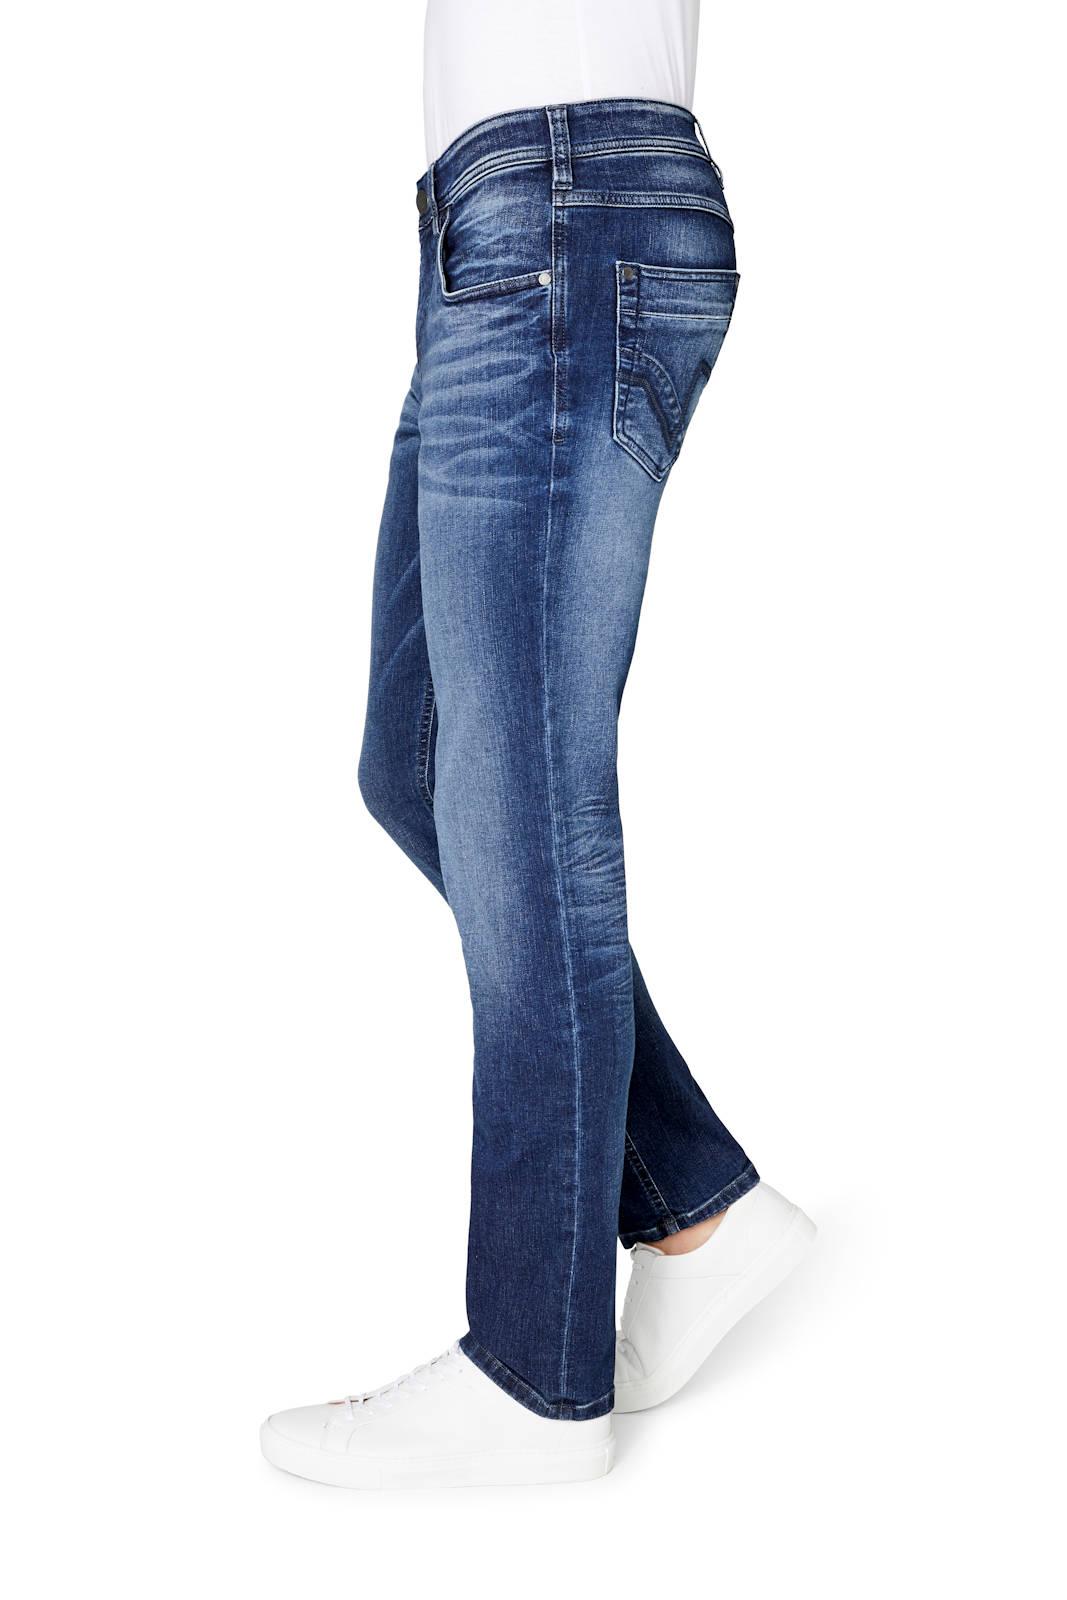 Atelier-GARDEUR-Jeans-BILL-8-Modern-Fit-Herren-Hose-Slim-Leg-Denim-NEU Indexbild 7